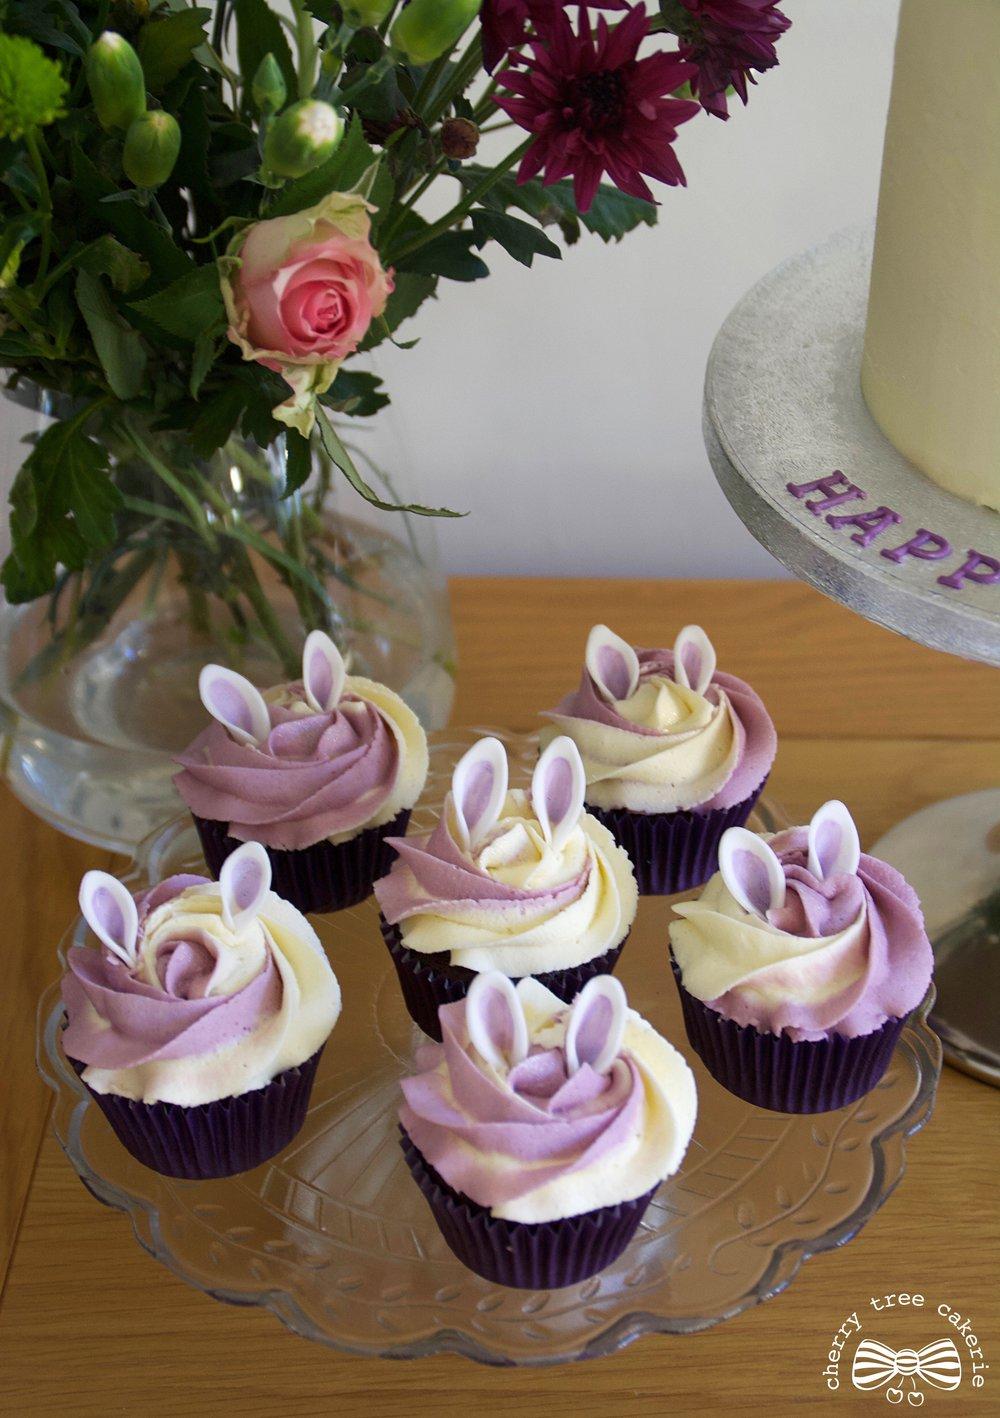 bunny-rabbit-ears-cupcakes